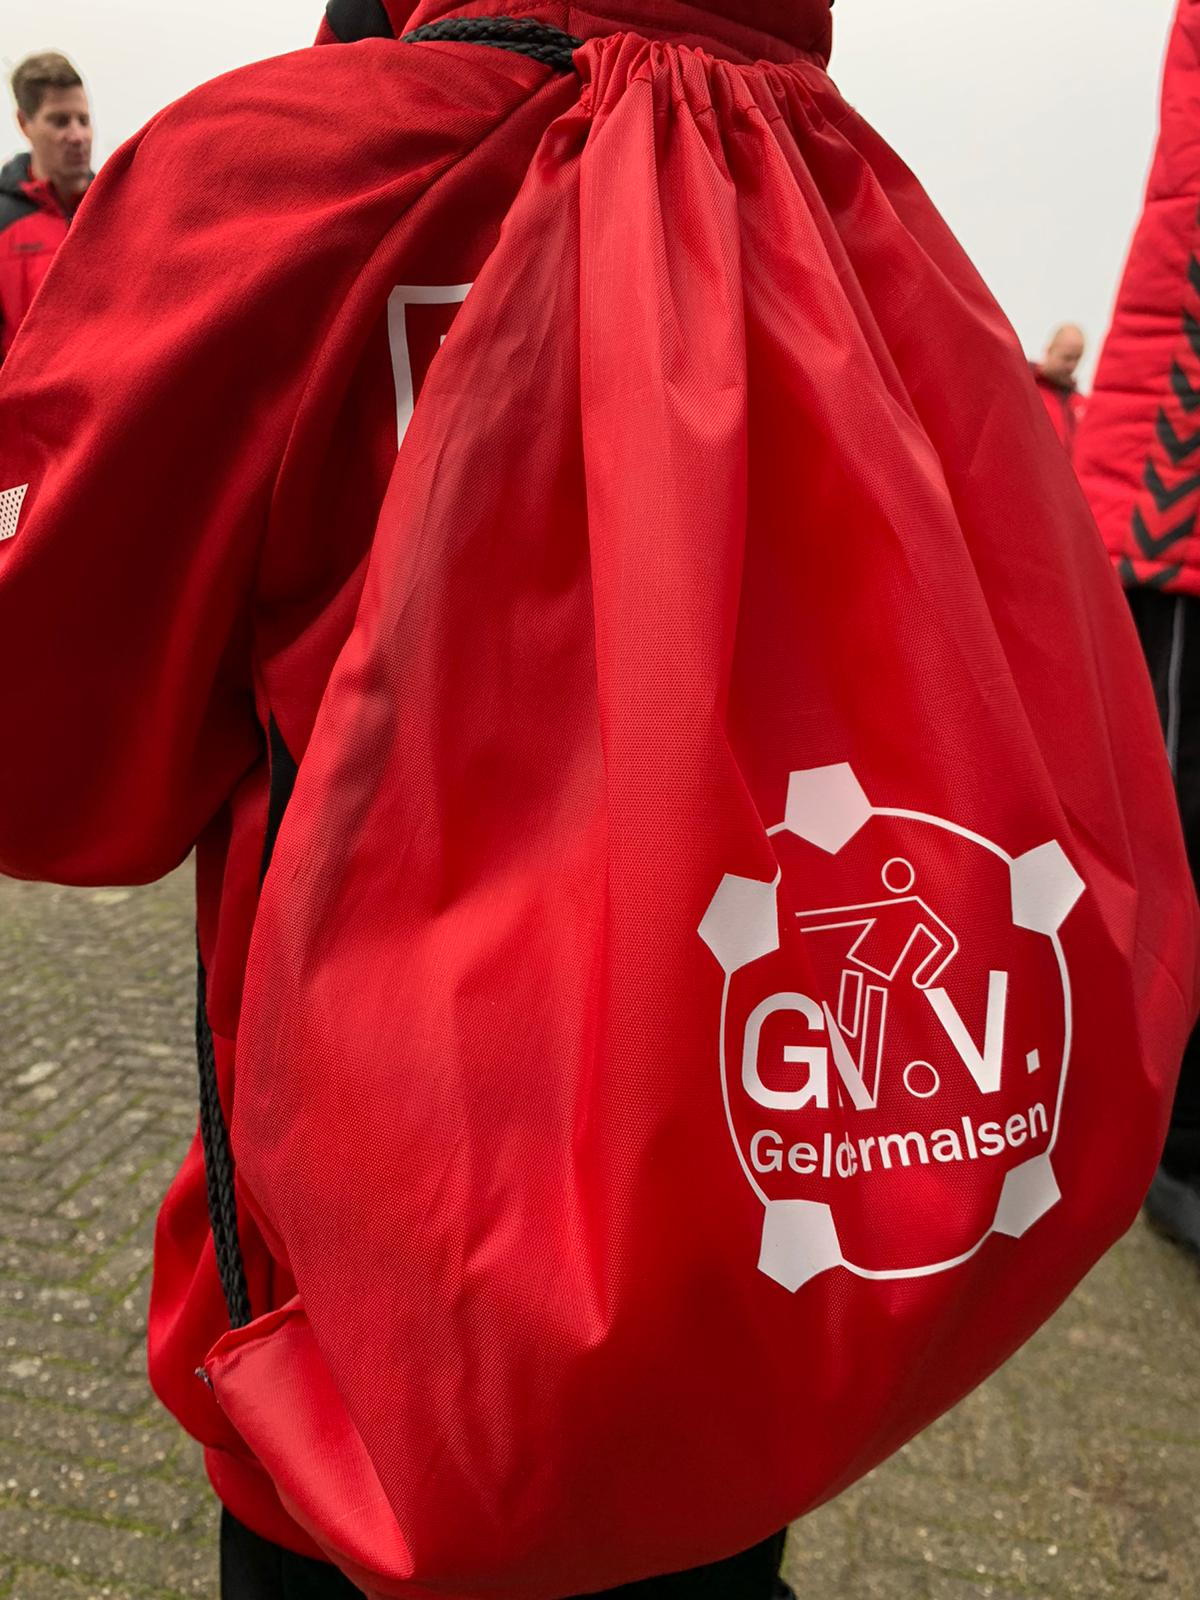 Samenwerking GVV & lokale ondernemers